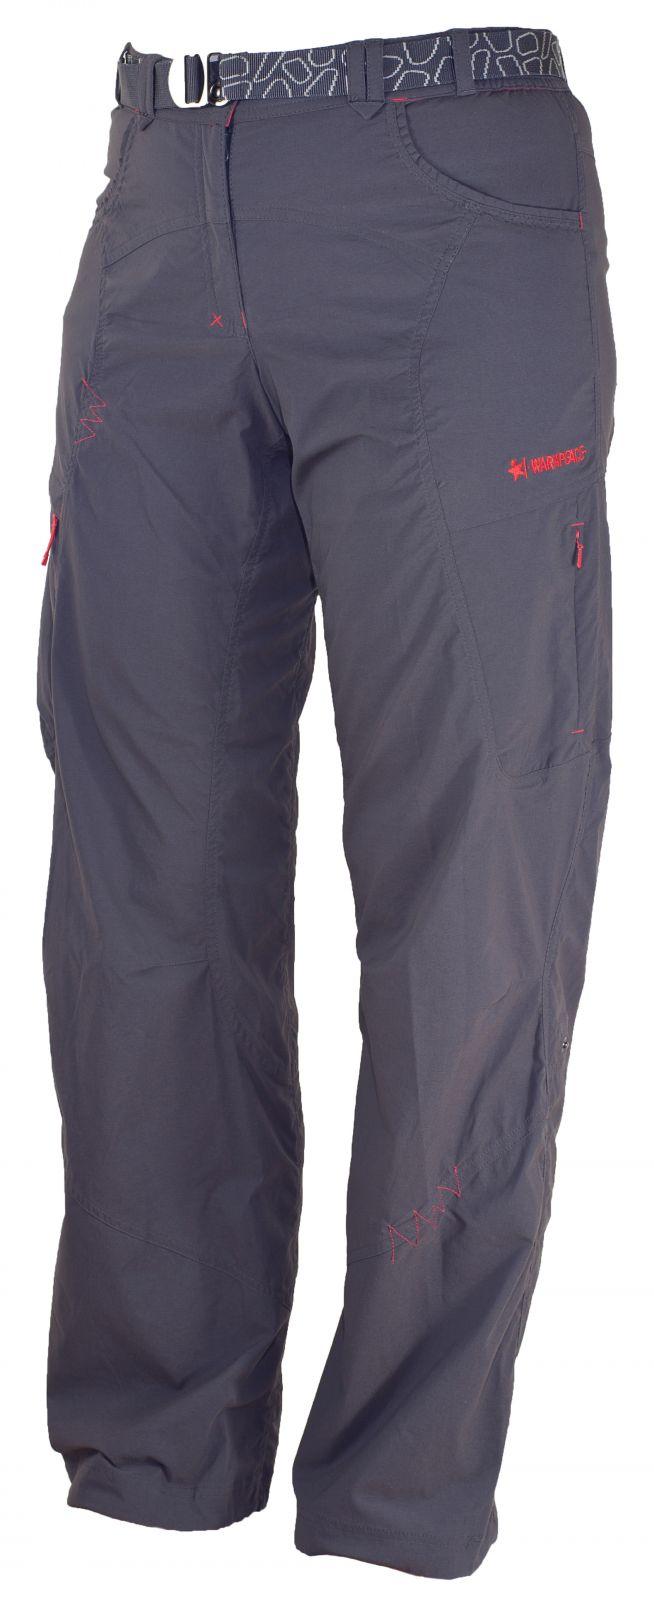 Warmpeace Muriel Lady Iron dámské kalhoty